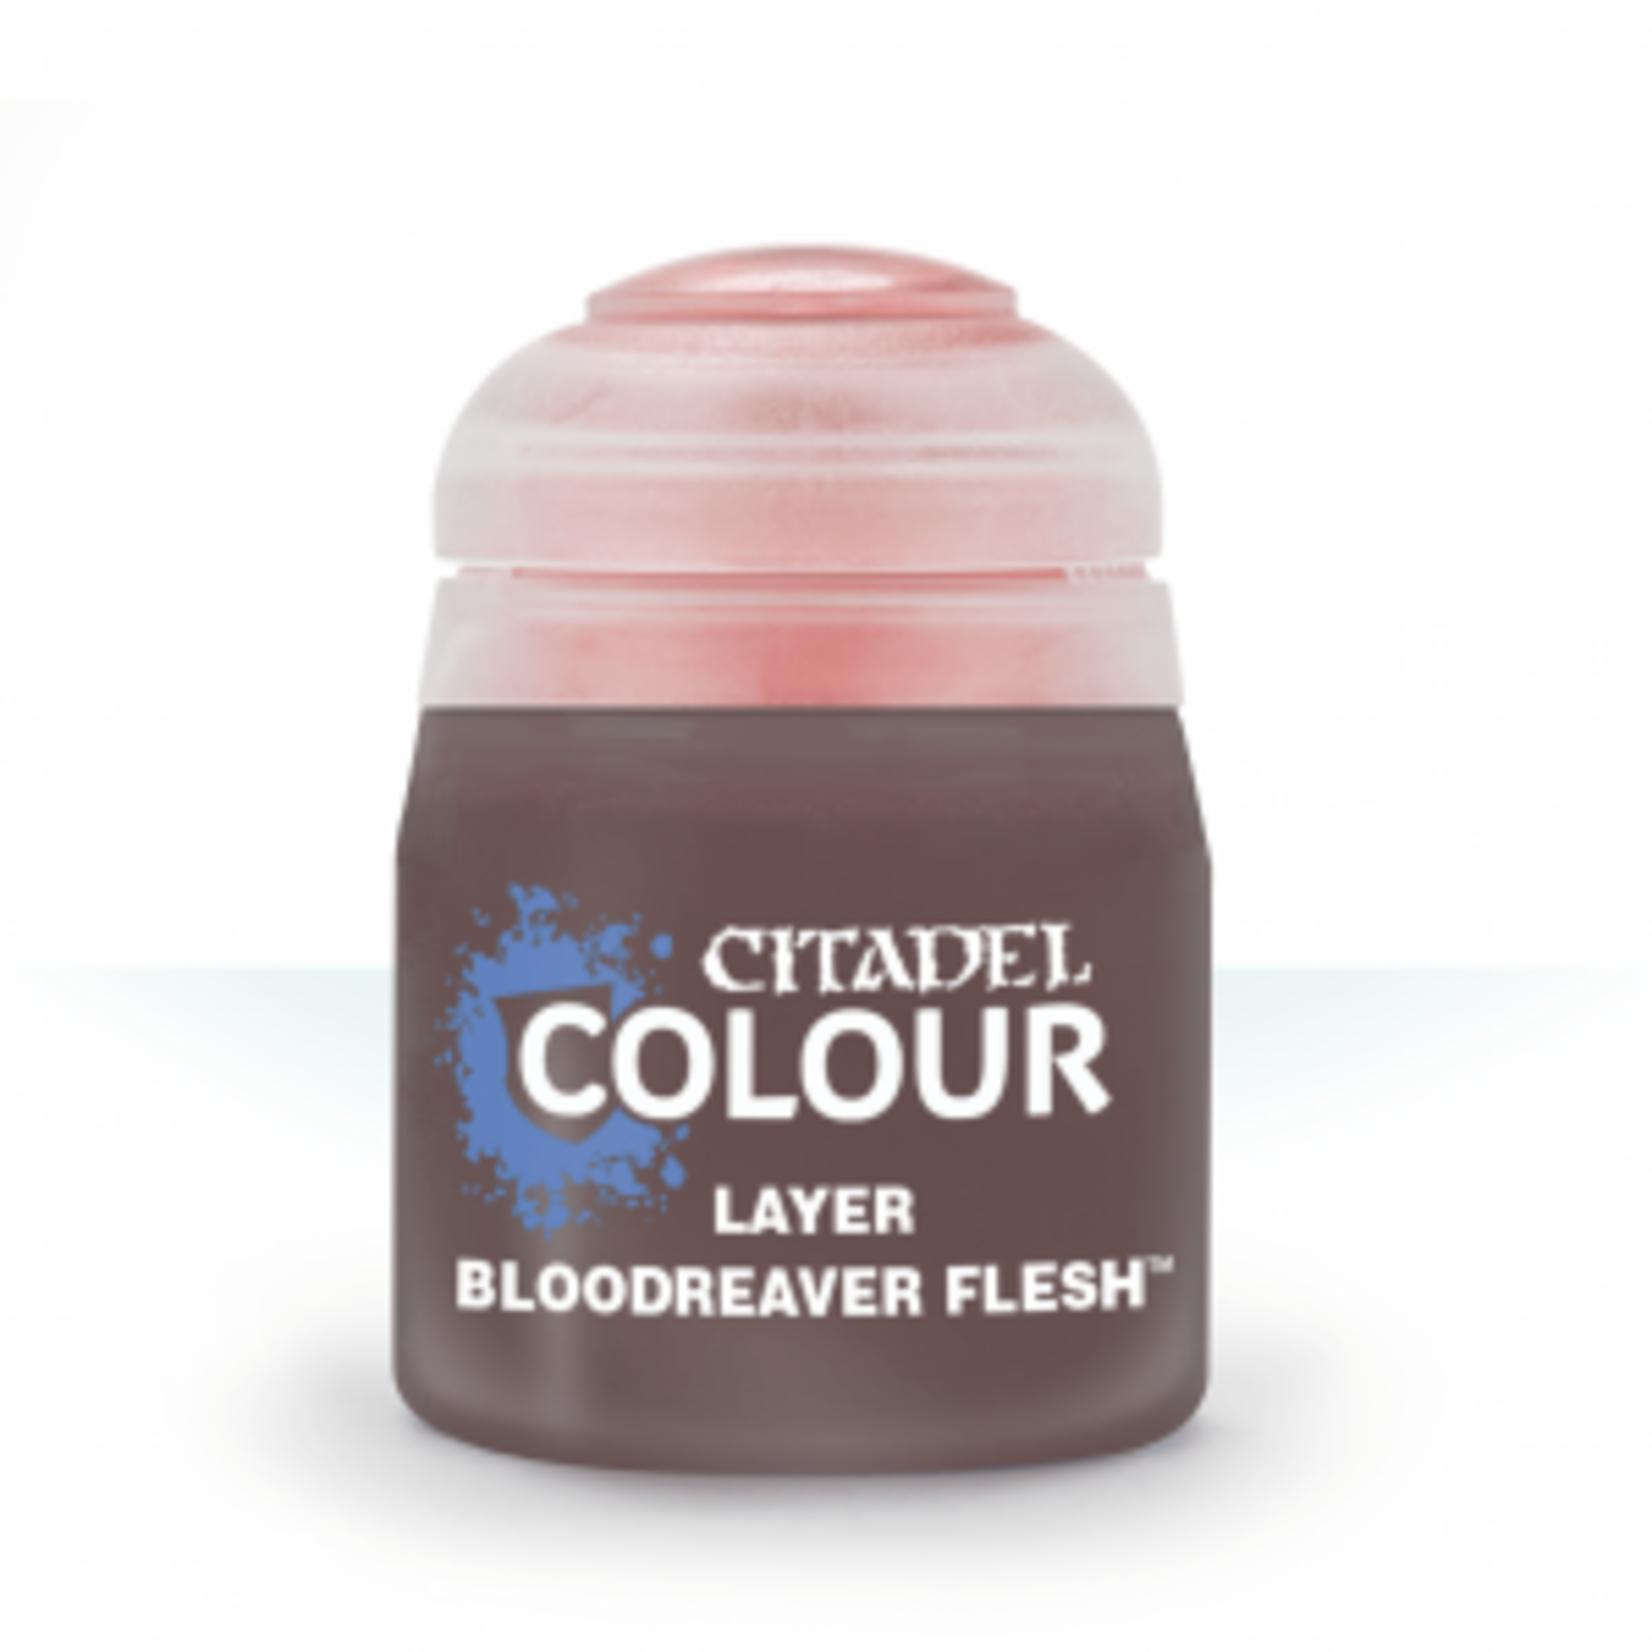 Citadel Layer Bloodreaver Flesh